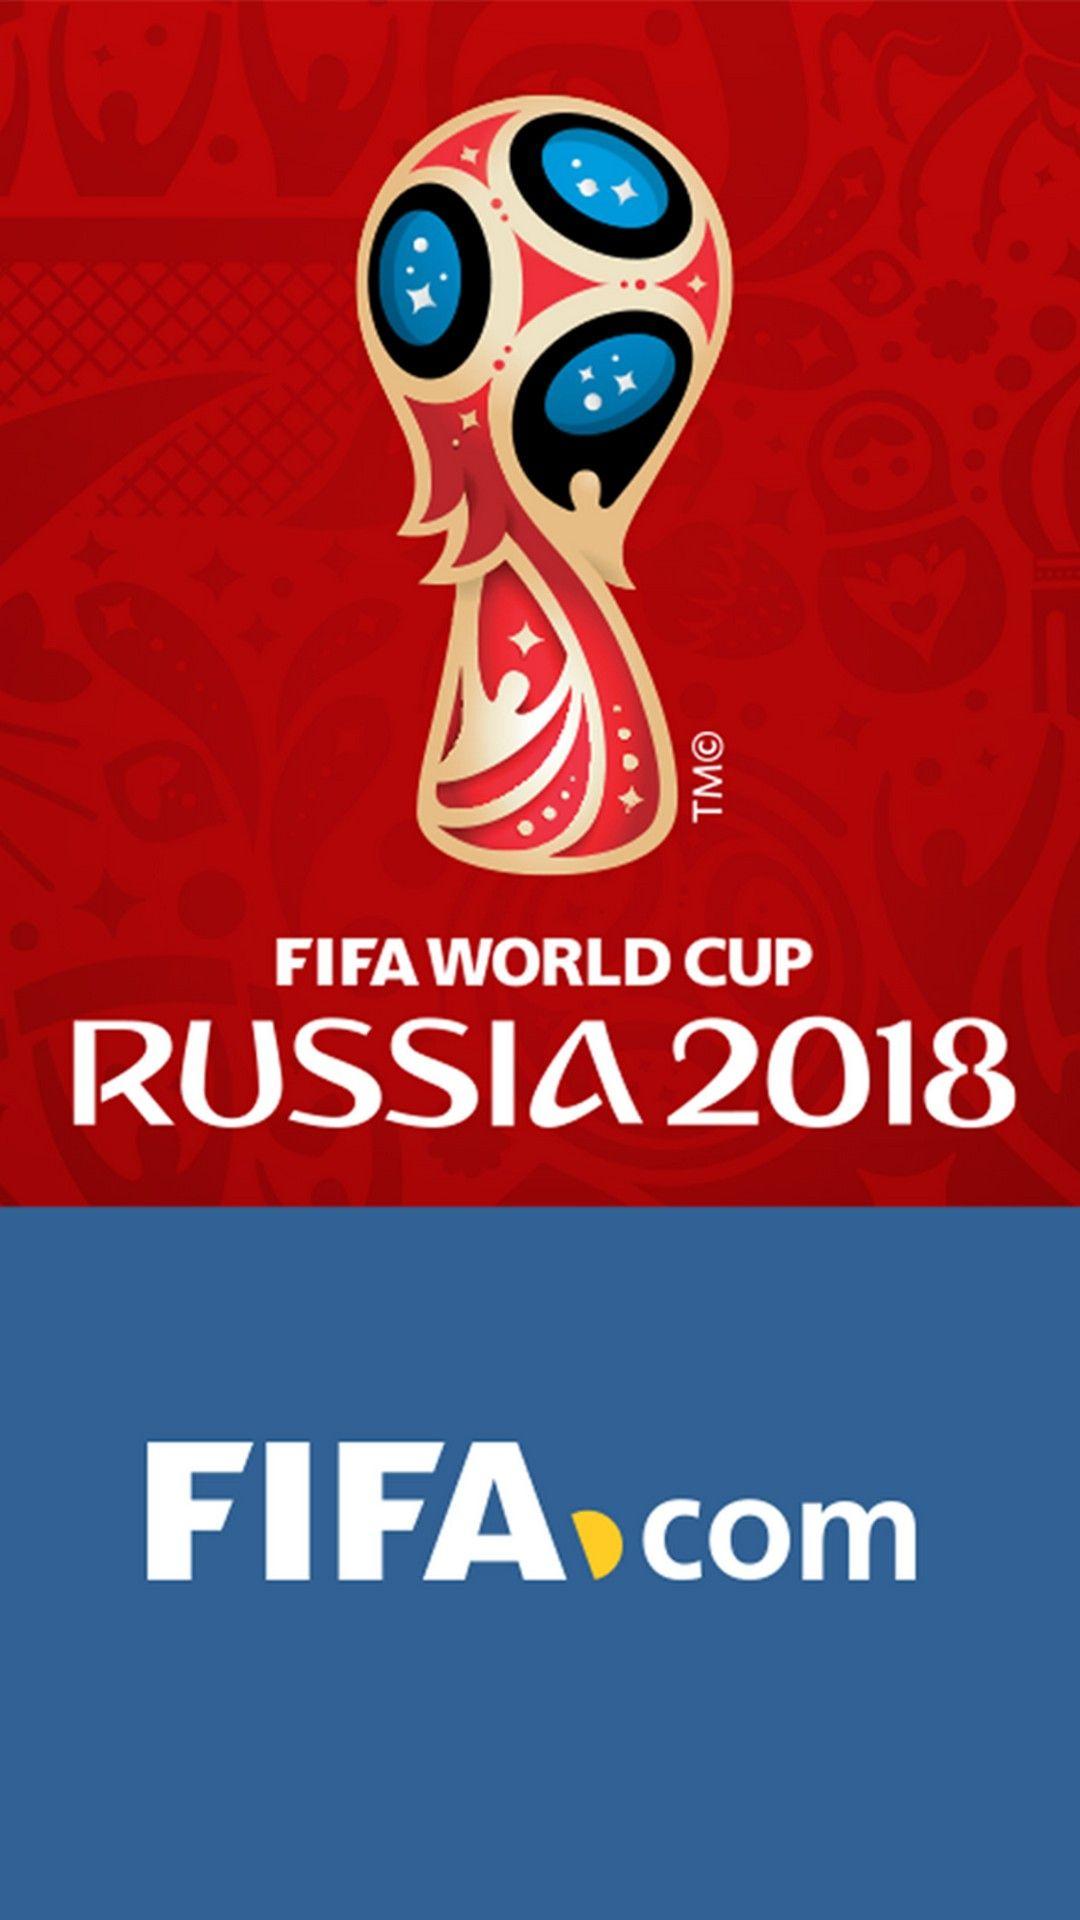 World Cup Iphone Wallpaper Best Iphone Wallpaper